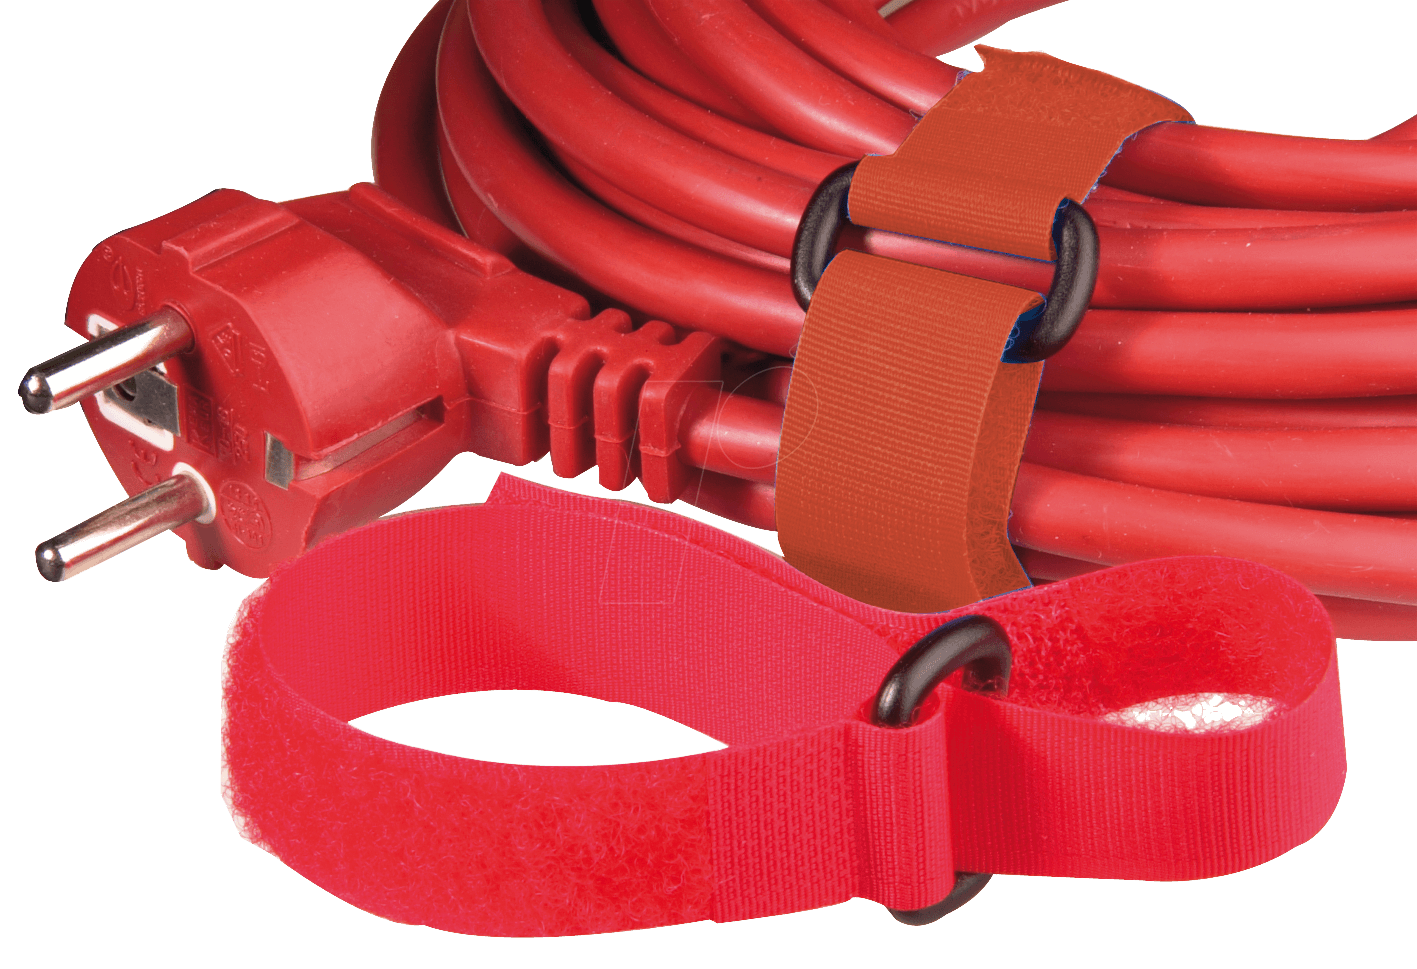 KLETTBAND 300 RT - Klettband mit Schlinge, 300 x 20 mm, rot